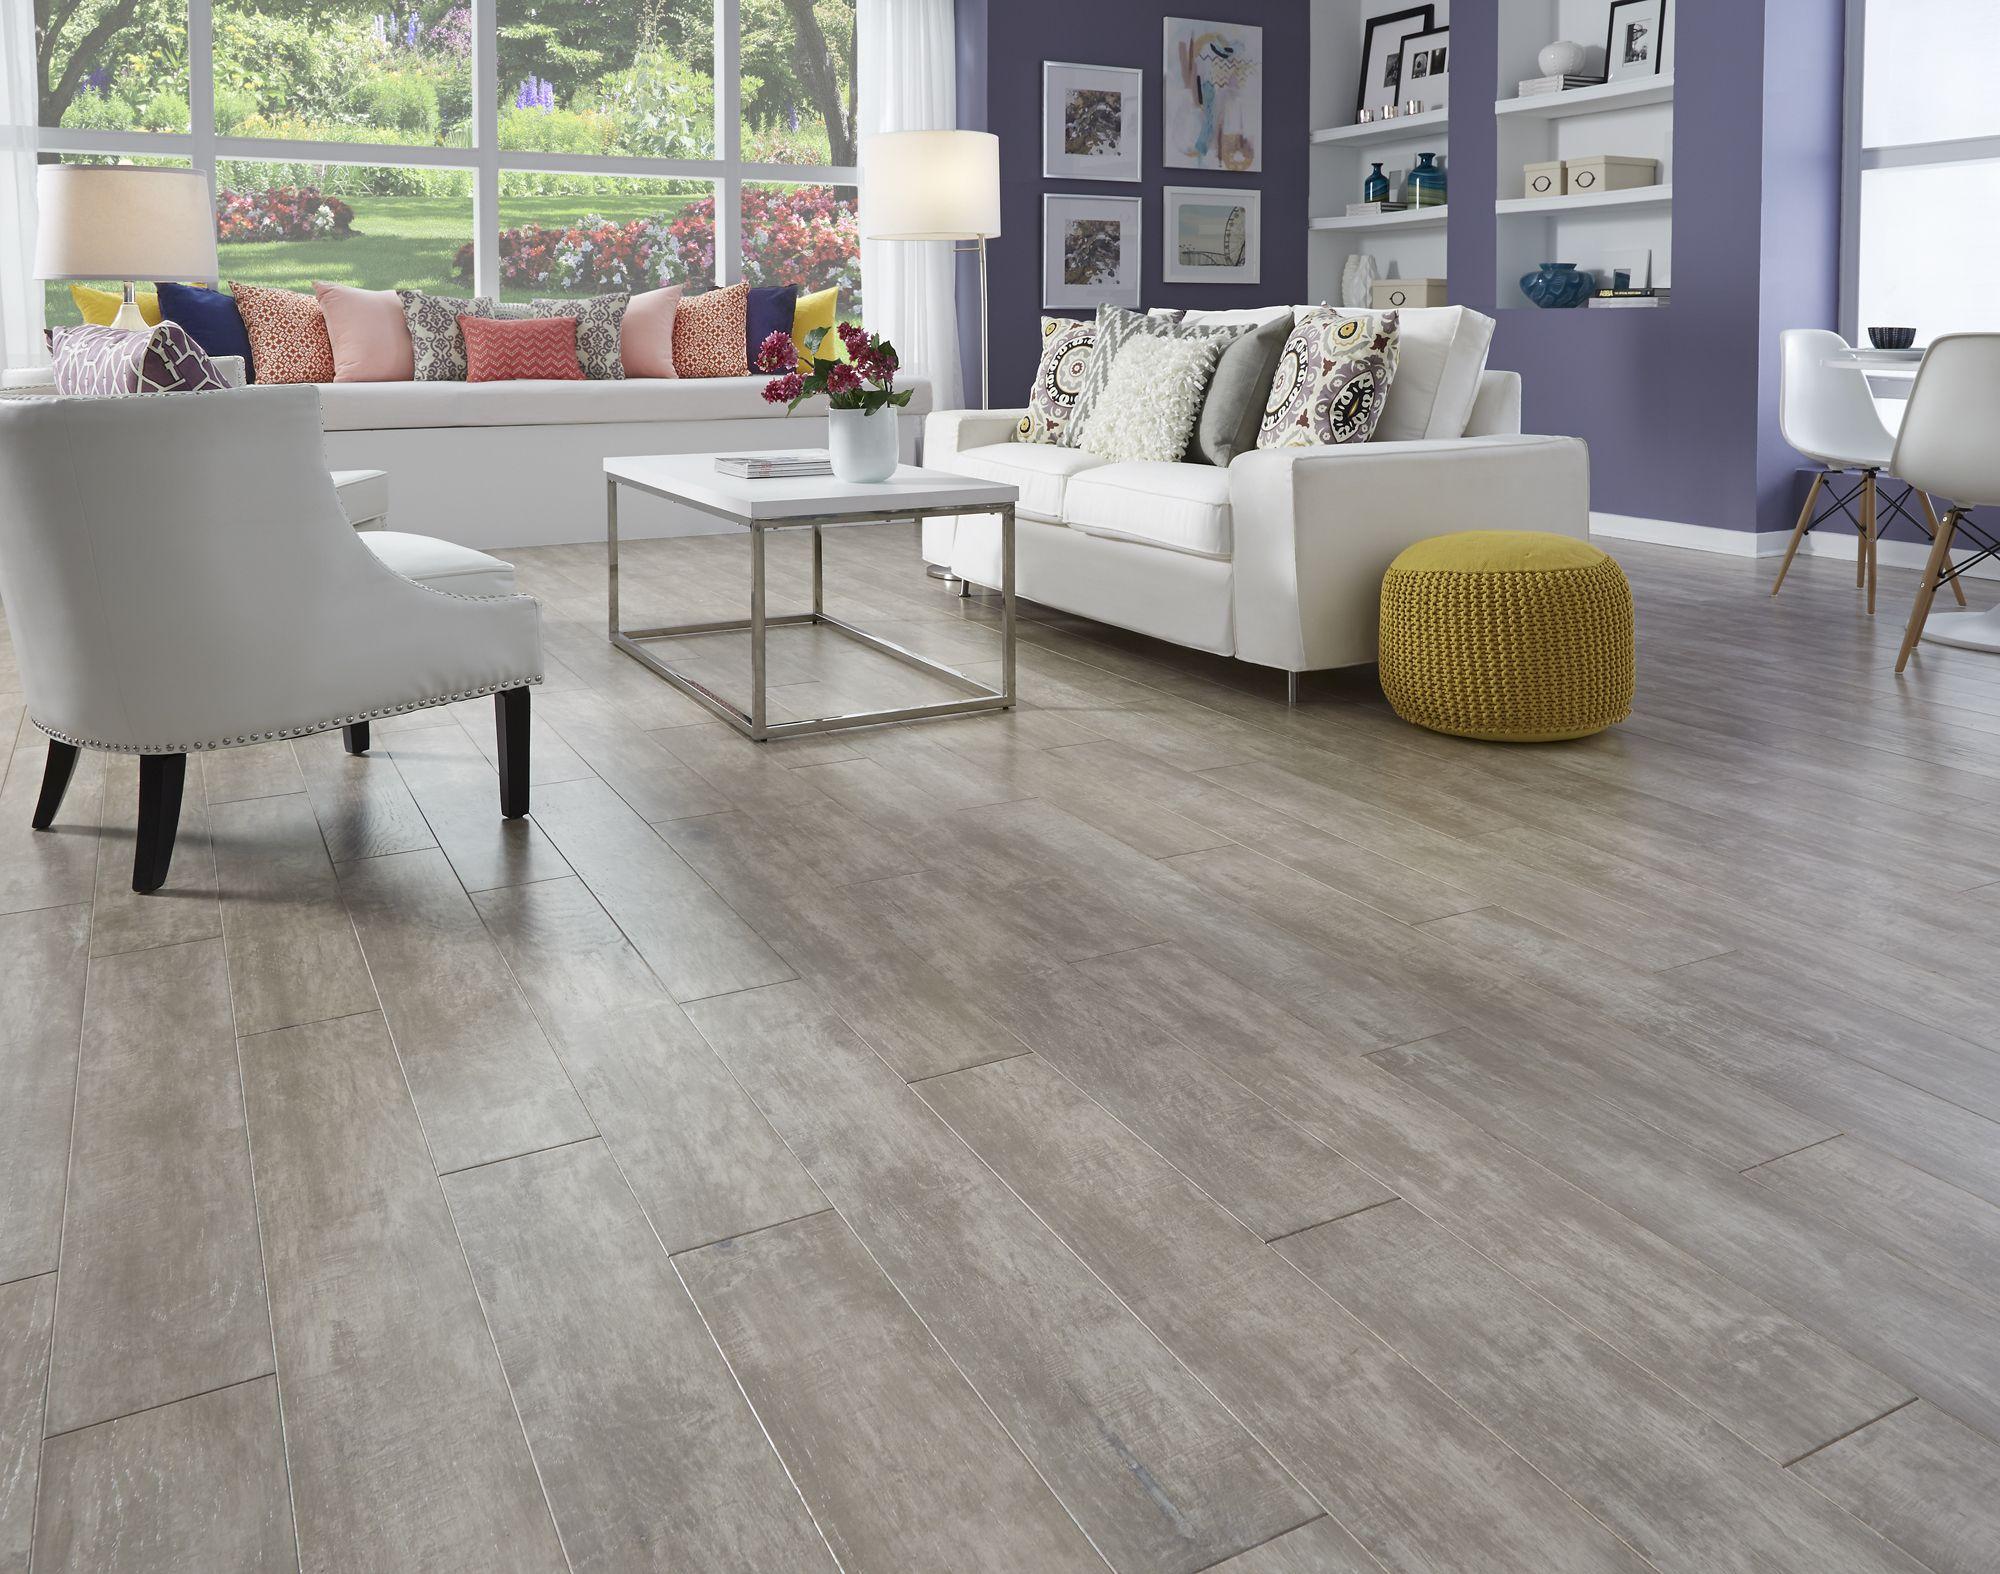 184 best Floors Hardwood images on Pinterest